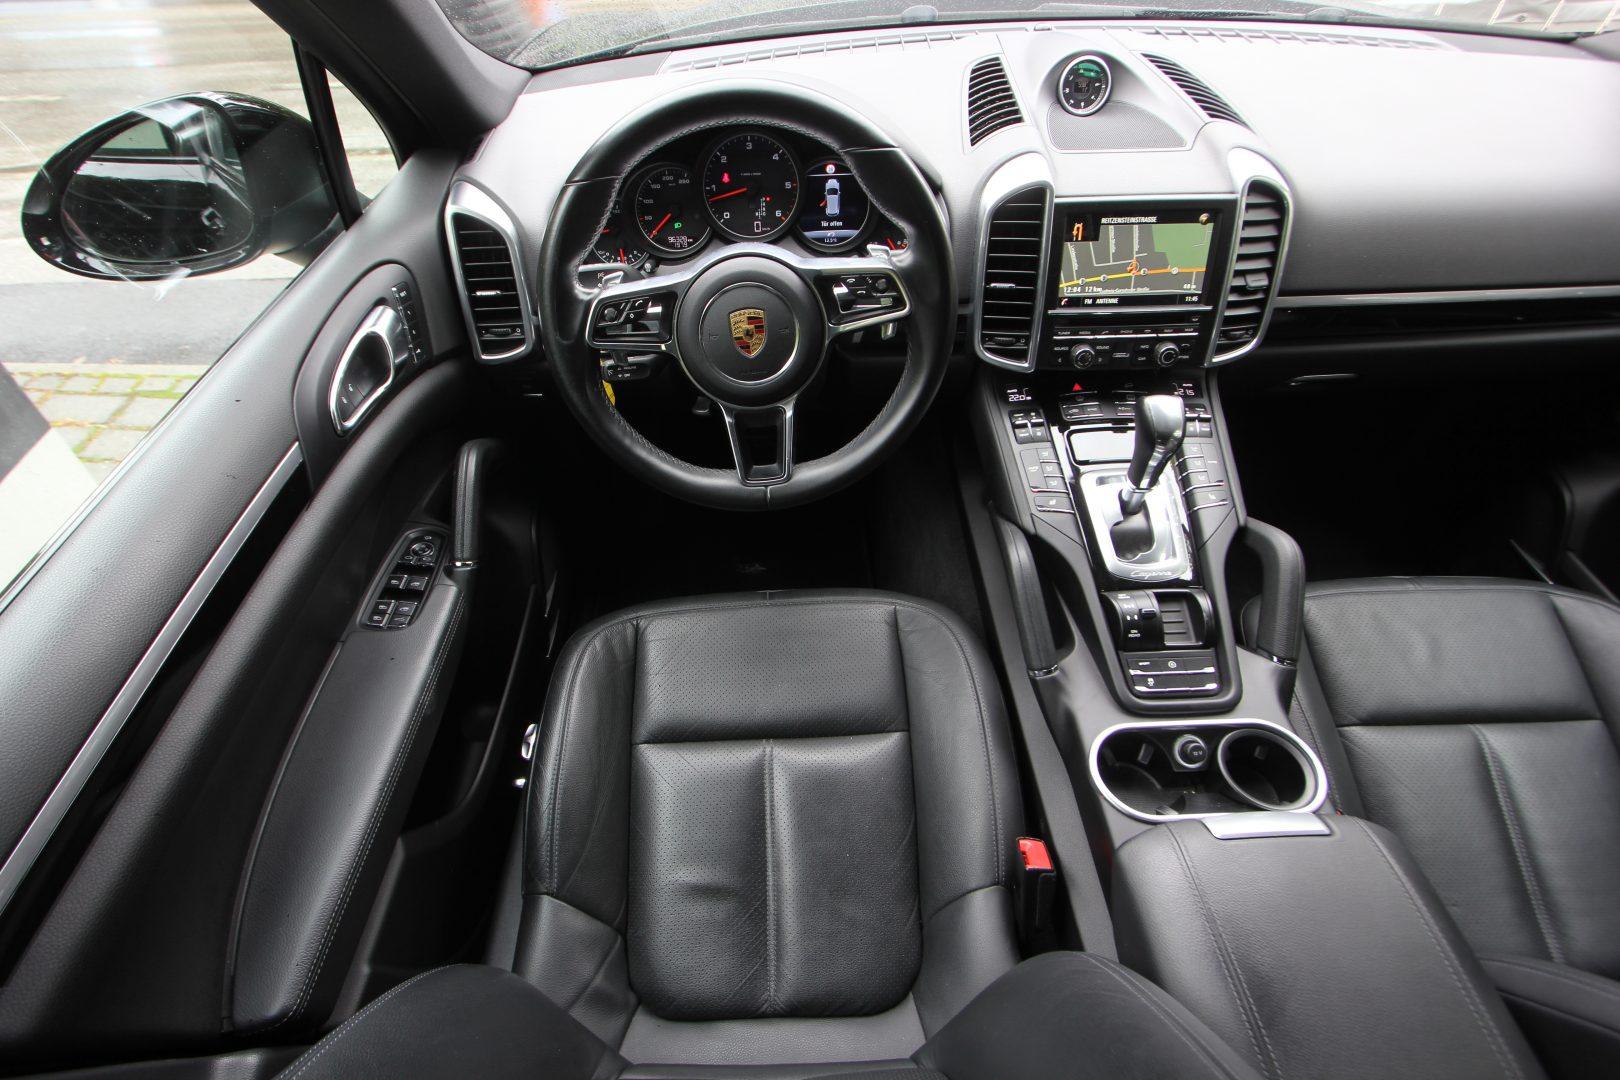 AIL Porsche Cayenne Panorama 21 Zoll  6